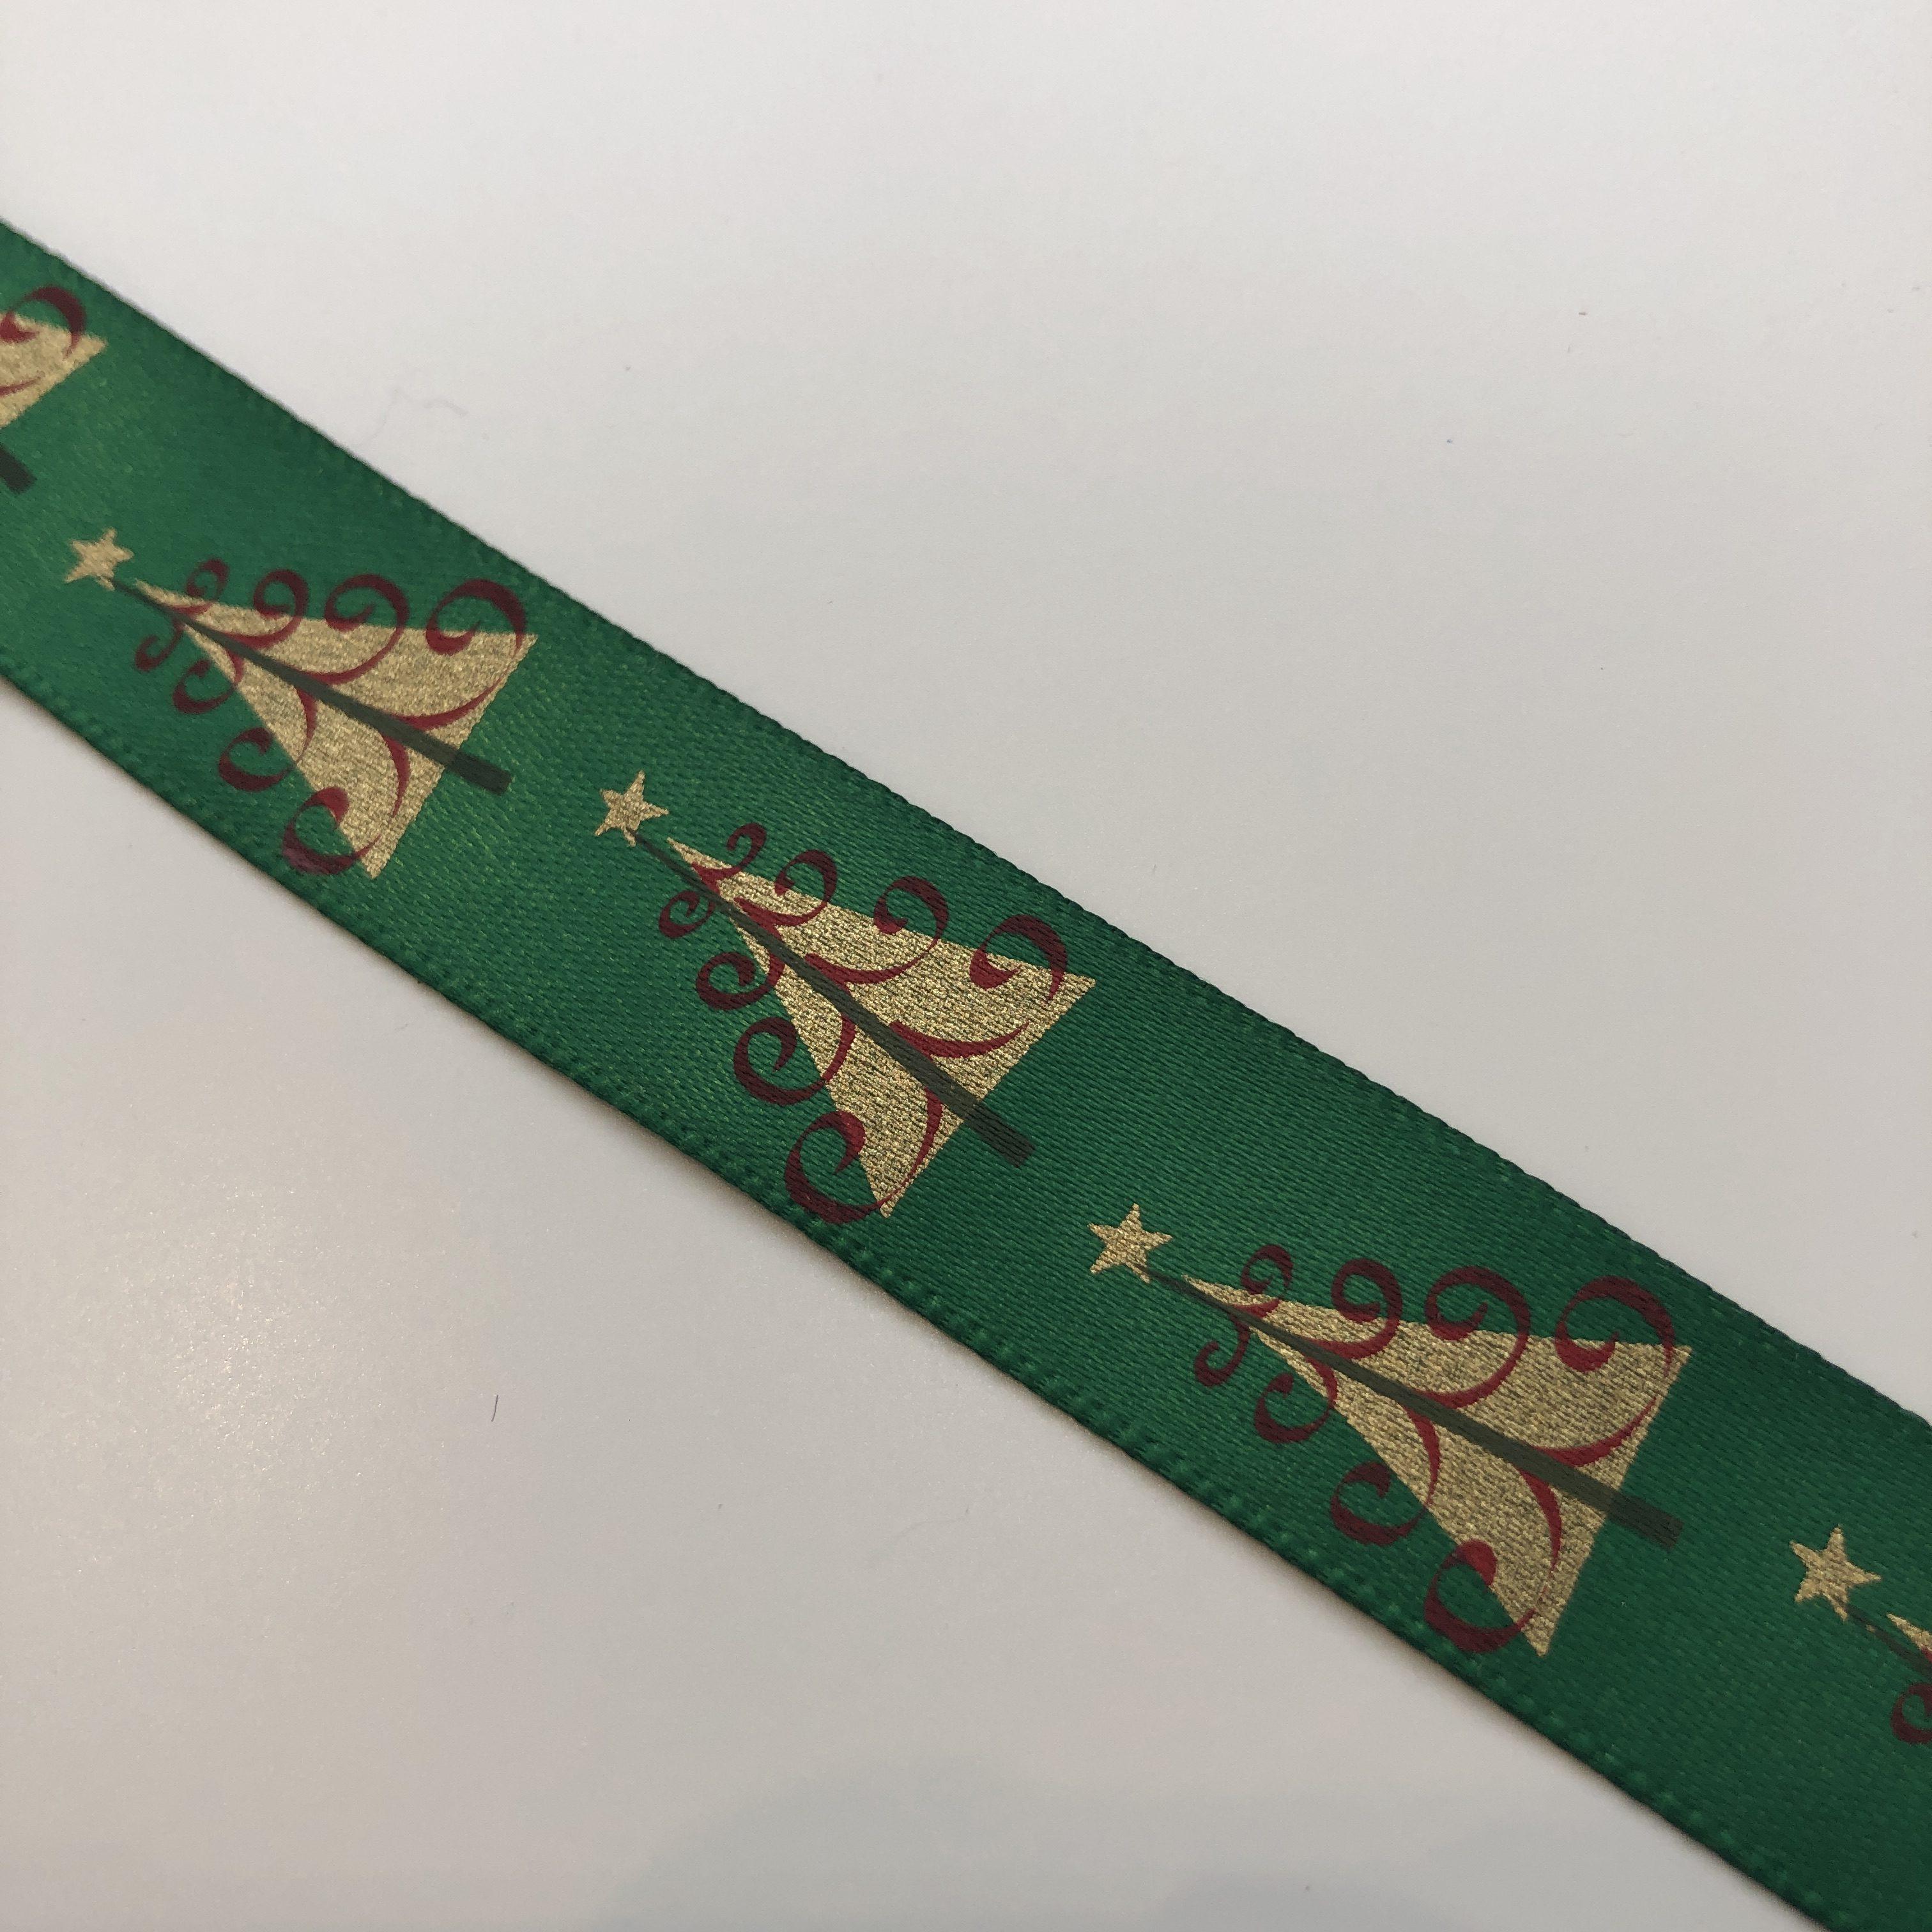 Printed Green Christmas Tree Ribbon